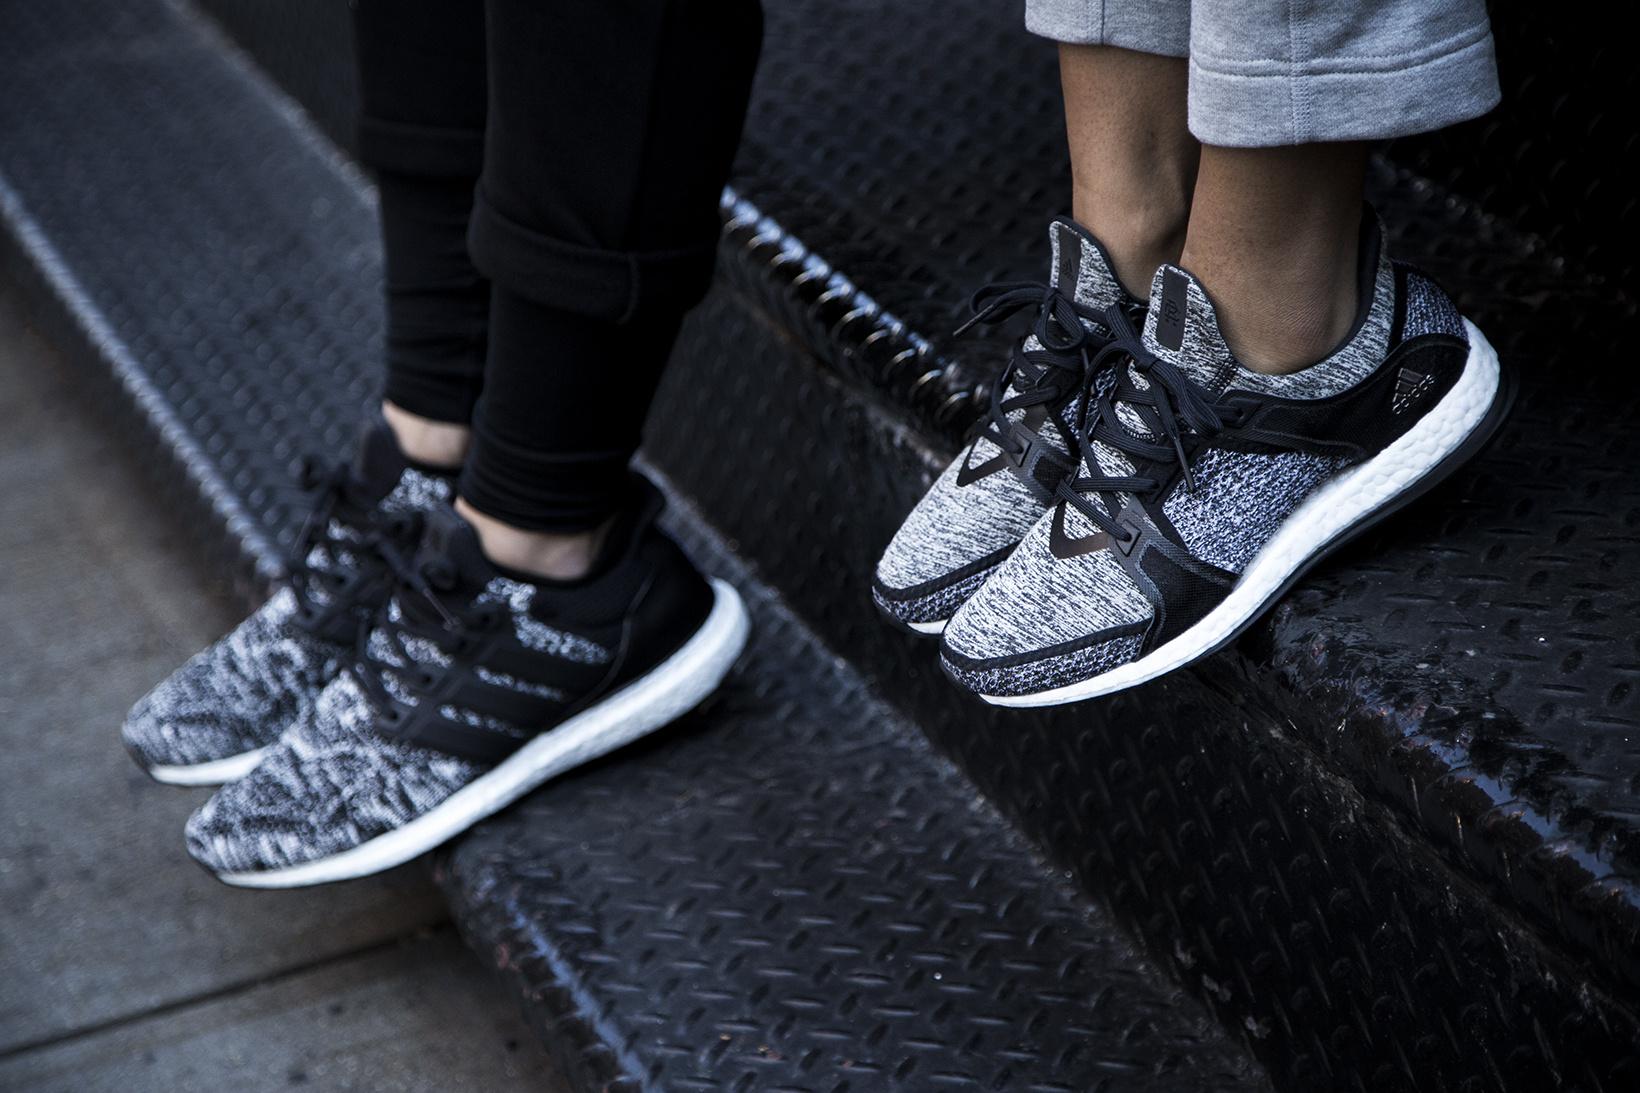 reigning-champ-adidas-pureboost-closer-look-1.jpg